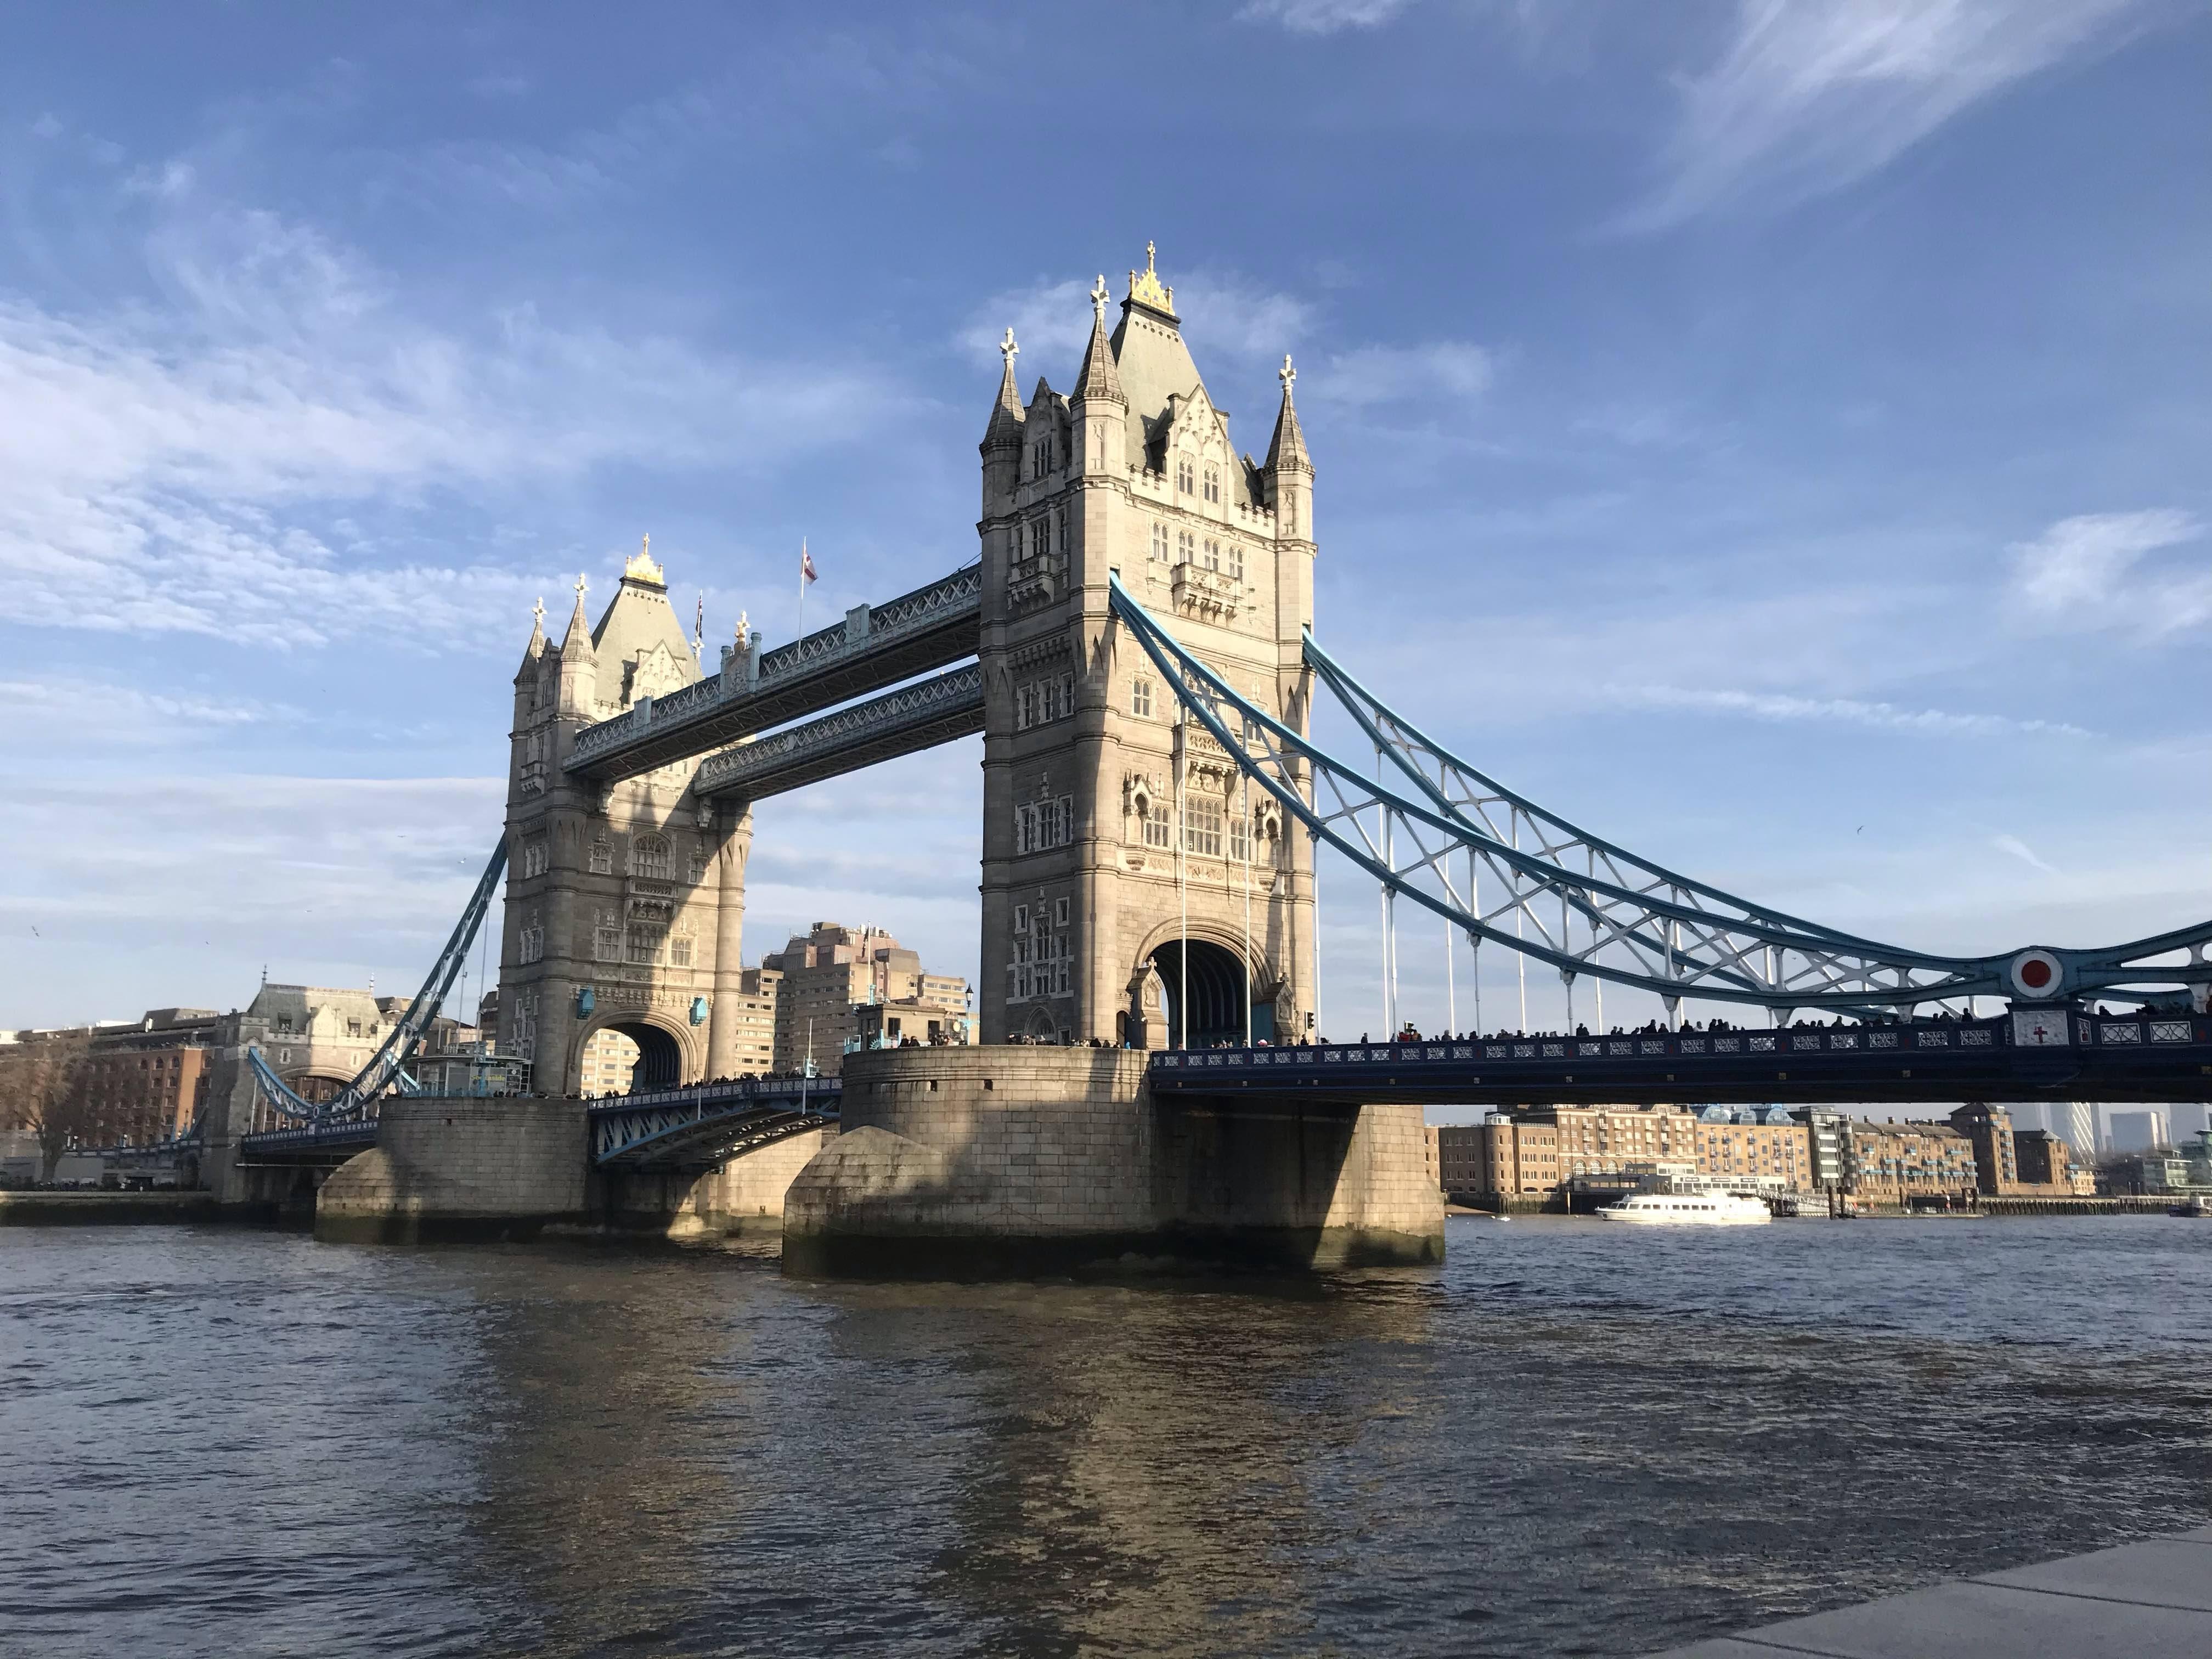 tower_bridge